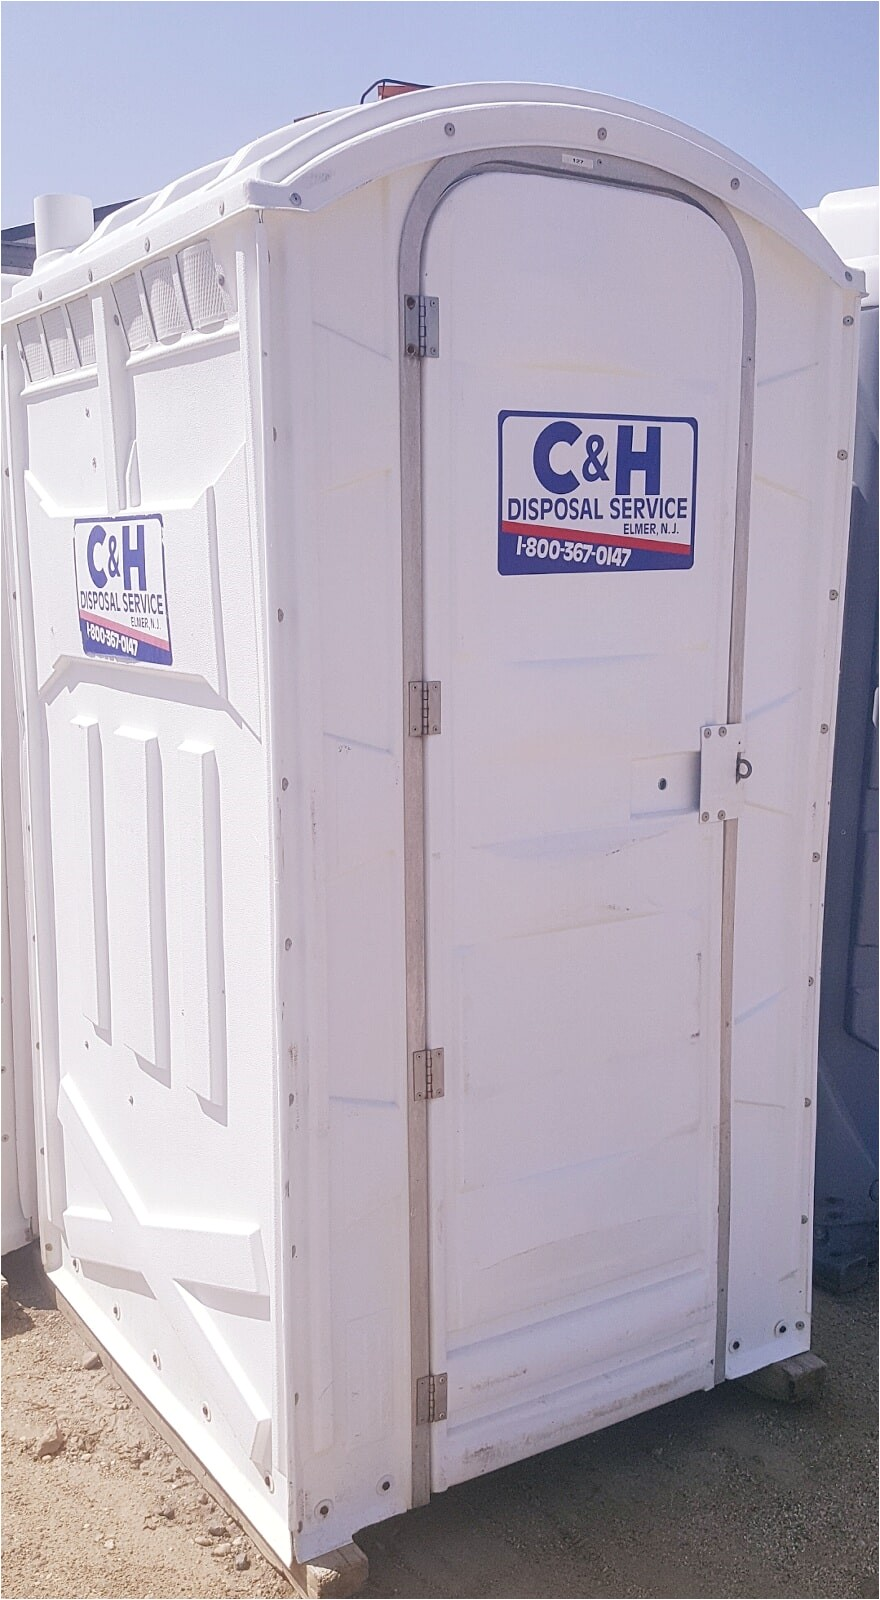 Porta Potty Rental Vineland Nj Portable toilets Elmer Nj C H Disposal Service Inc